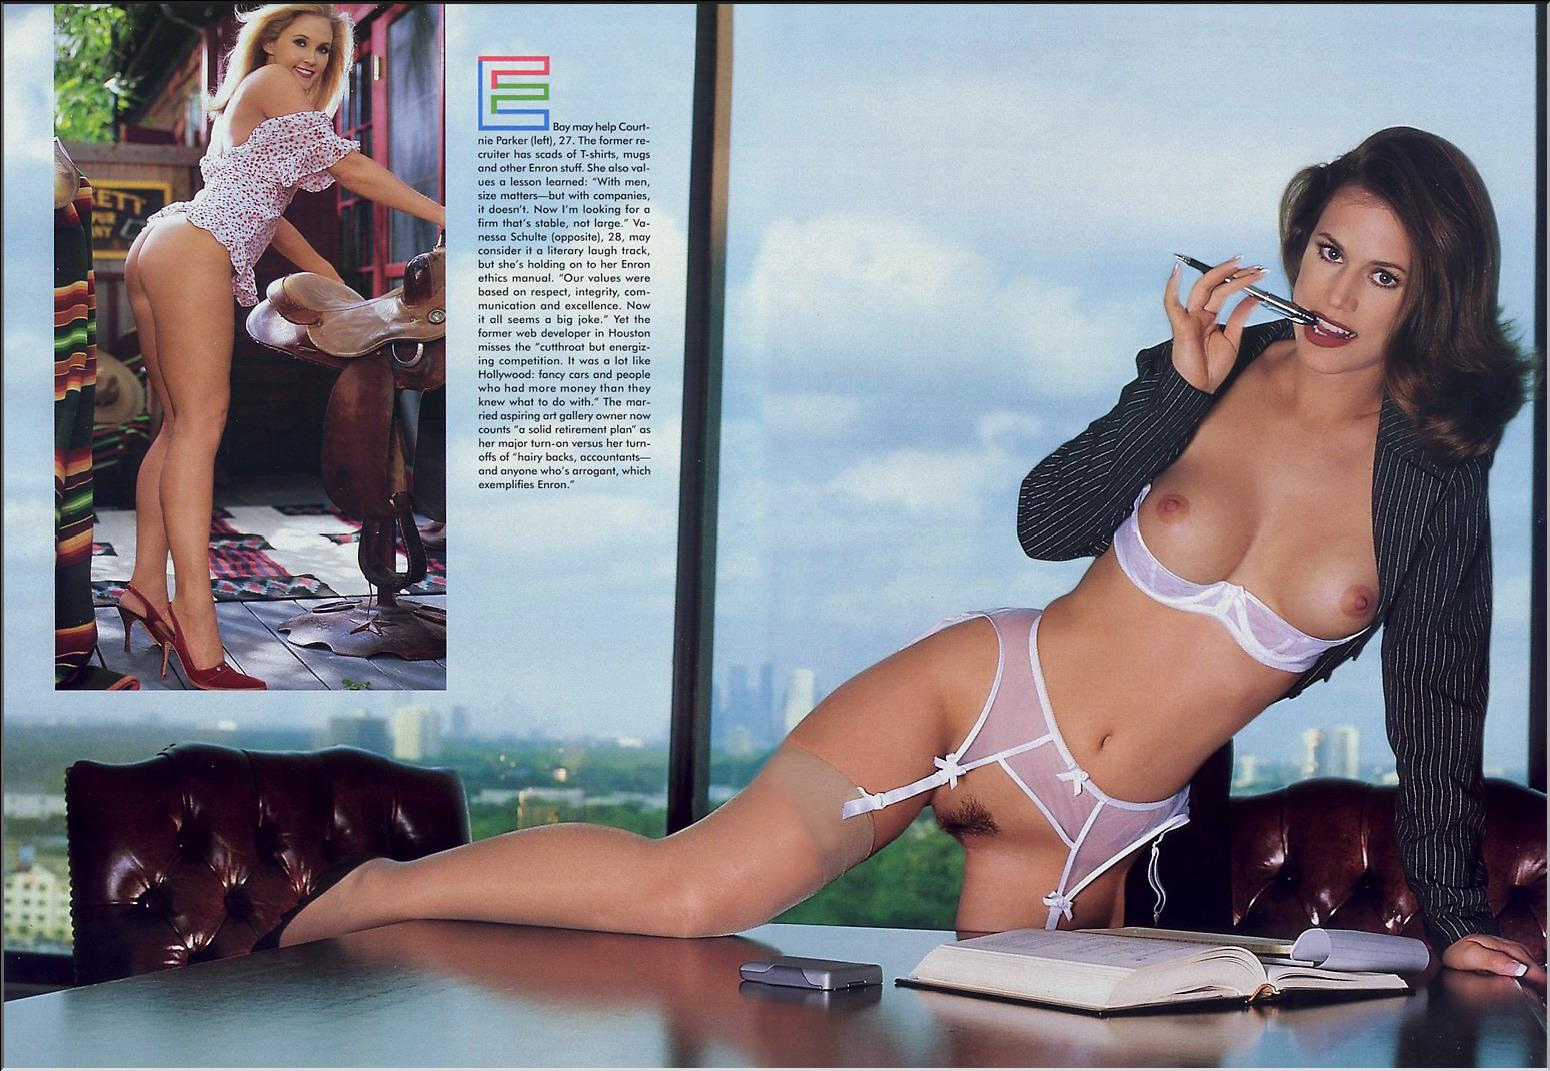 nudes Enron playboy